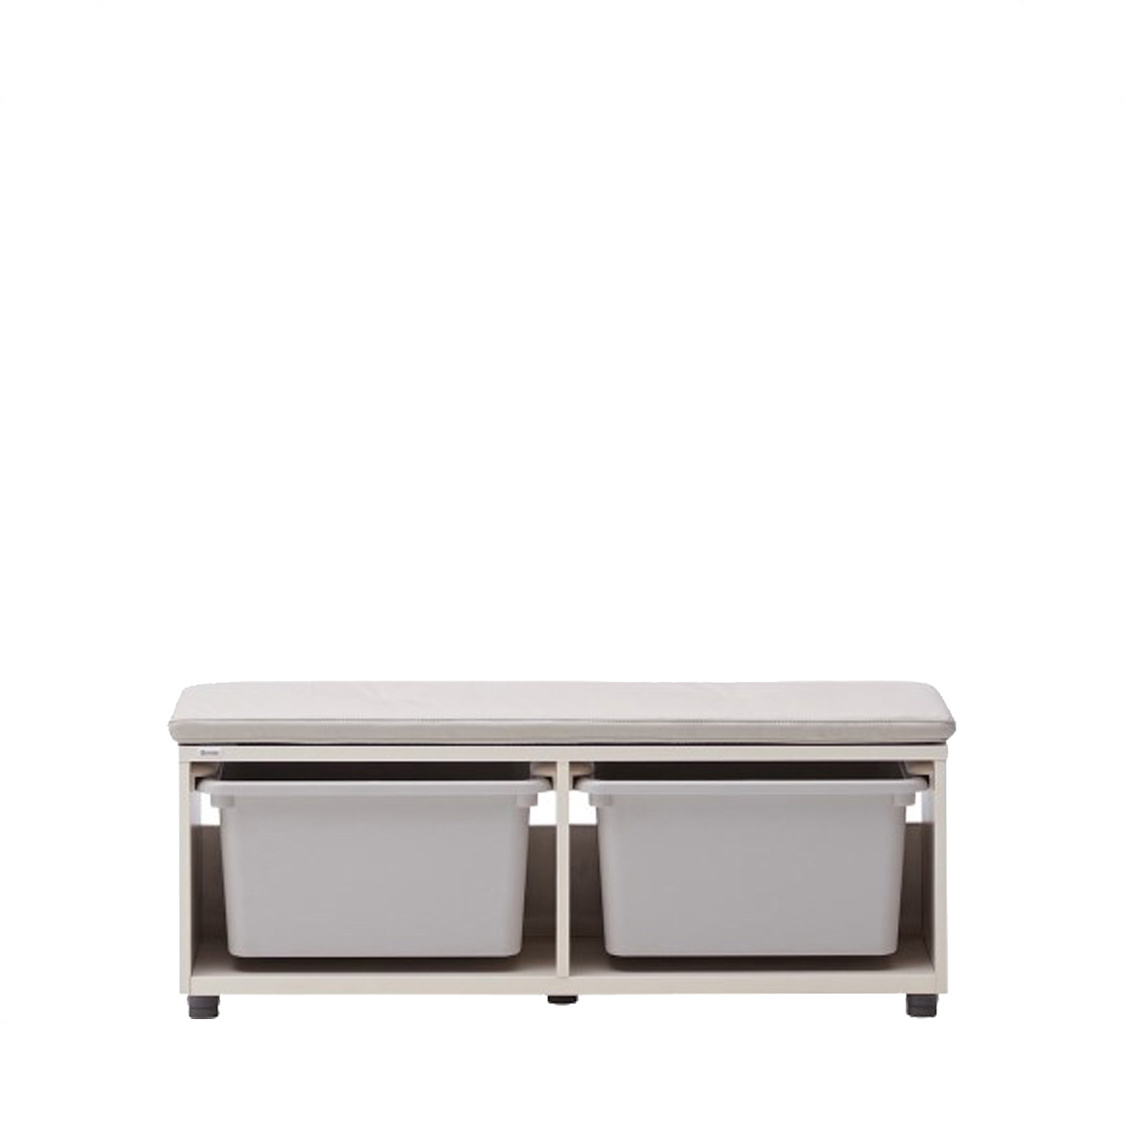 Iloom 950W Bench with storage HSFP191-IVGY